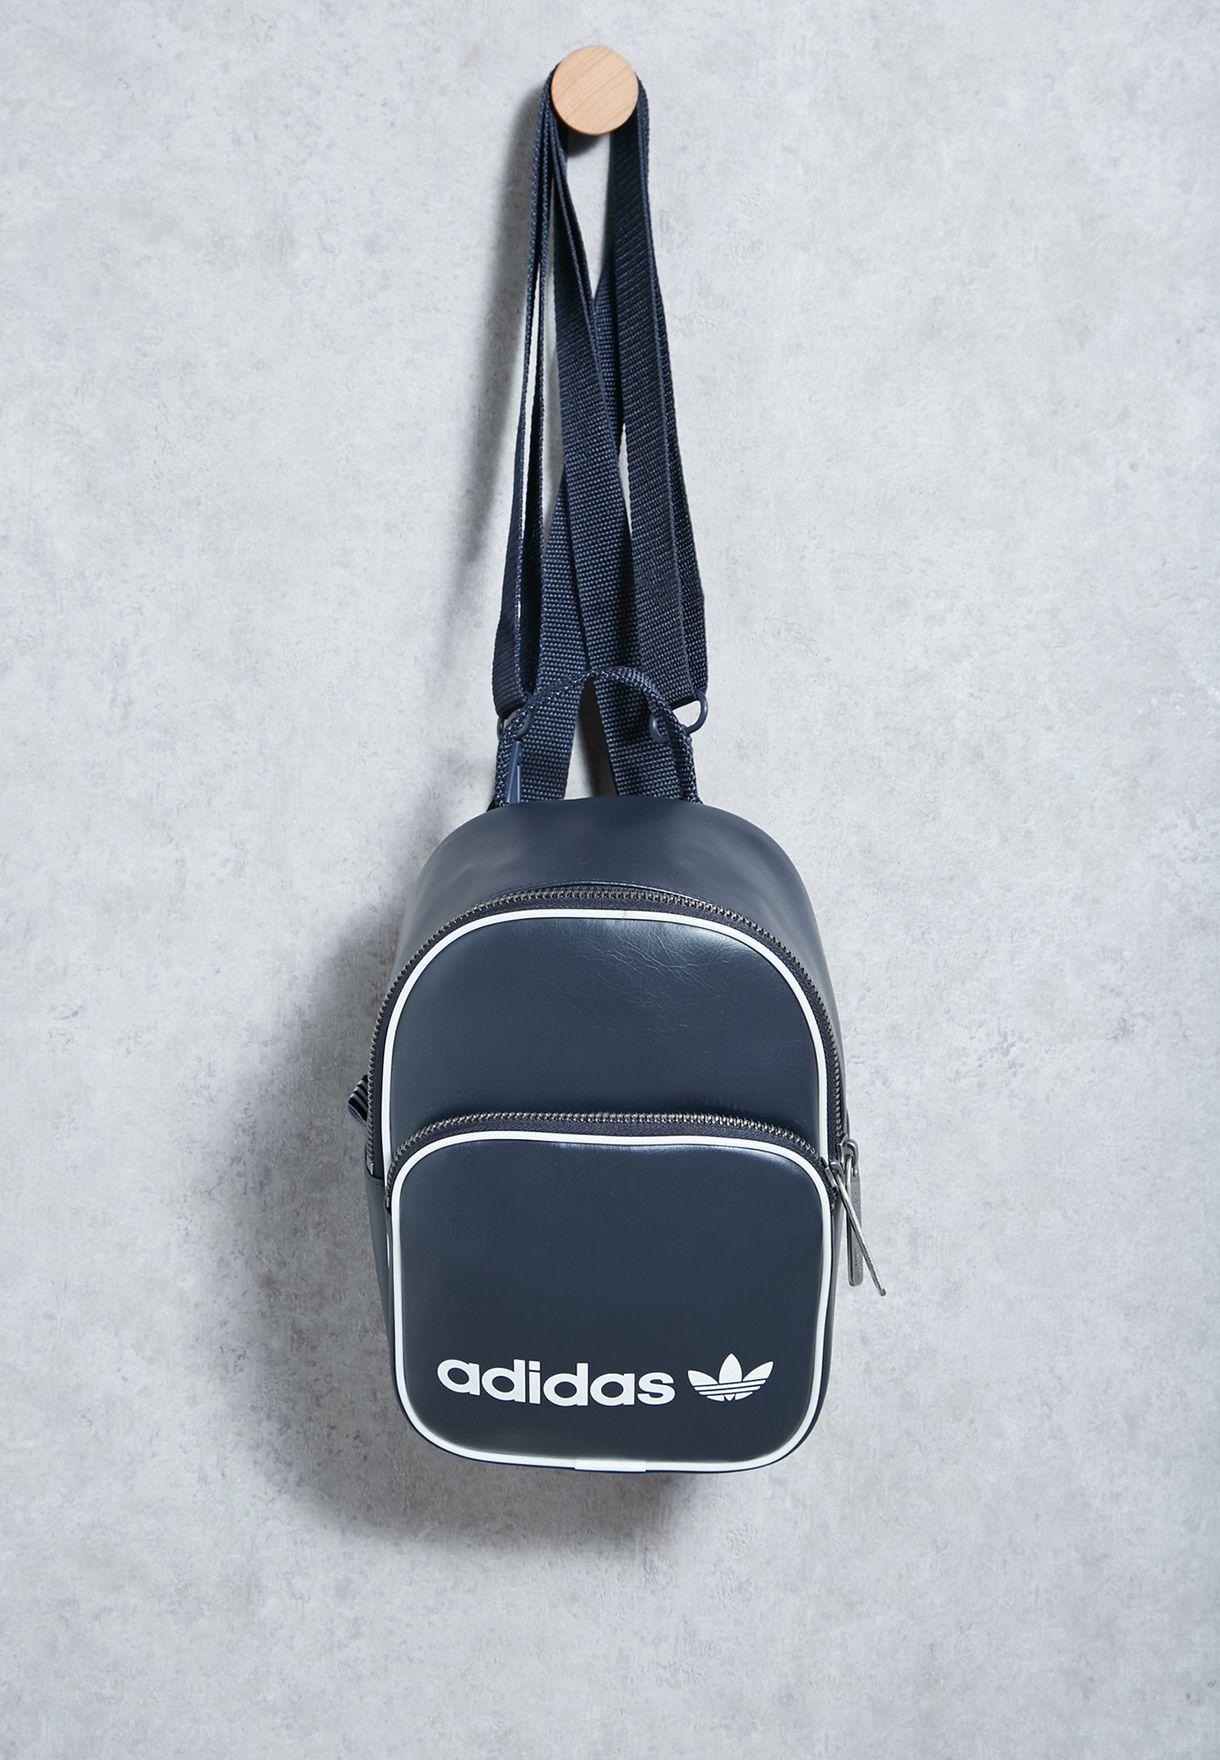 2e72521f0bbb Adidas Mini Backpack Grey- Fenix Toulouse Handball